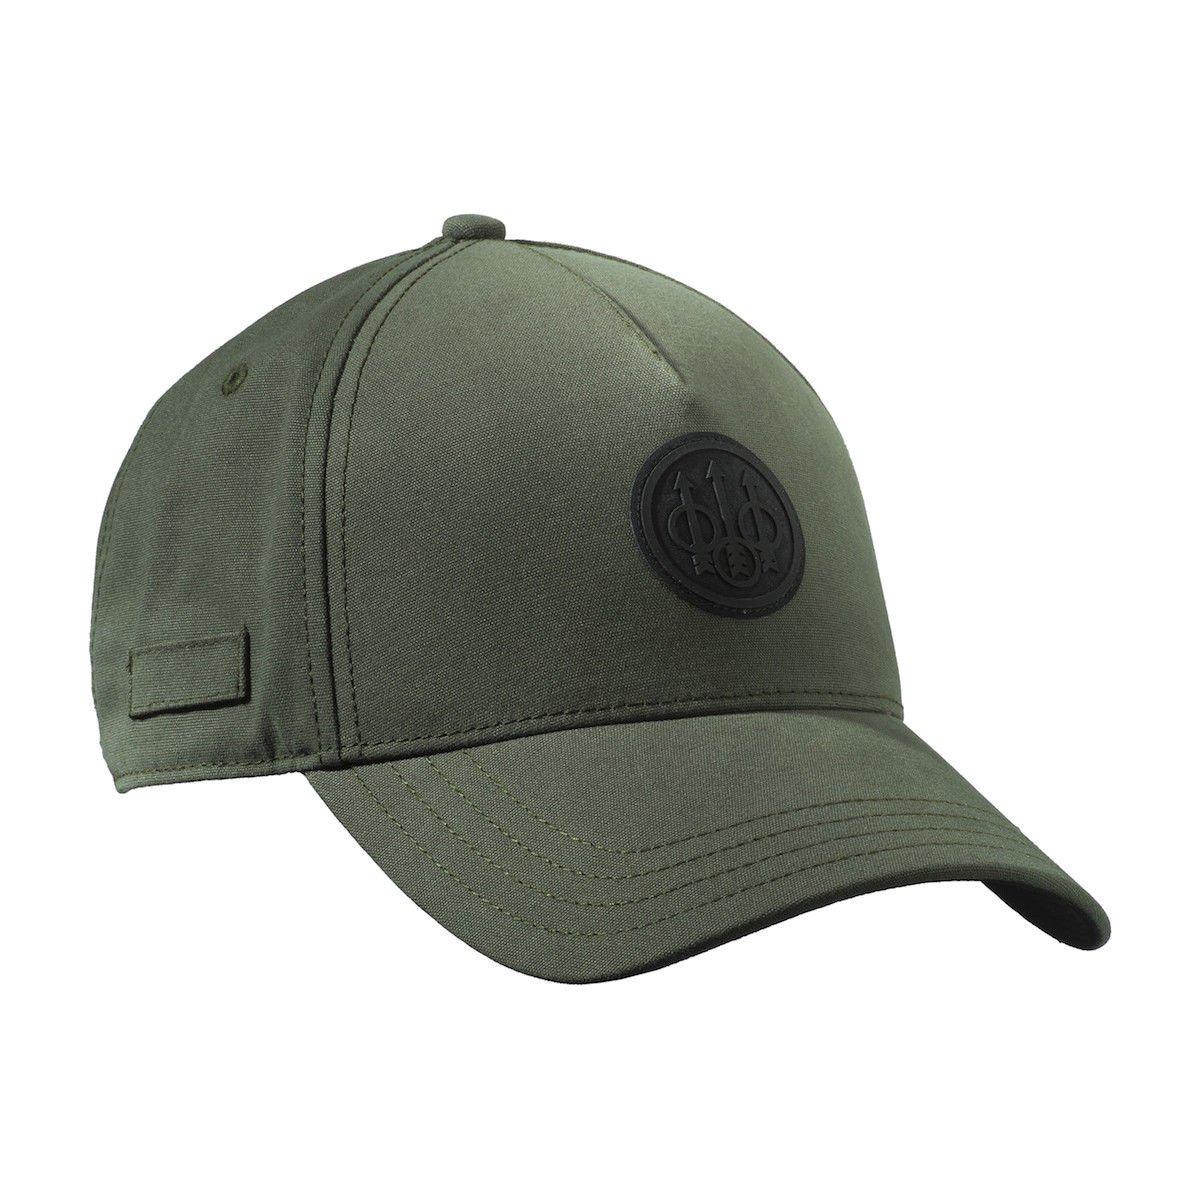 Beretta Rubber Patch Logo Cap Green  Amazon.co.uk  Sports   Outdoors 9766c860c075